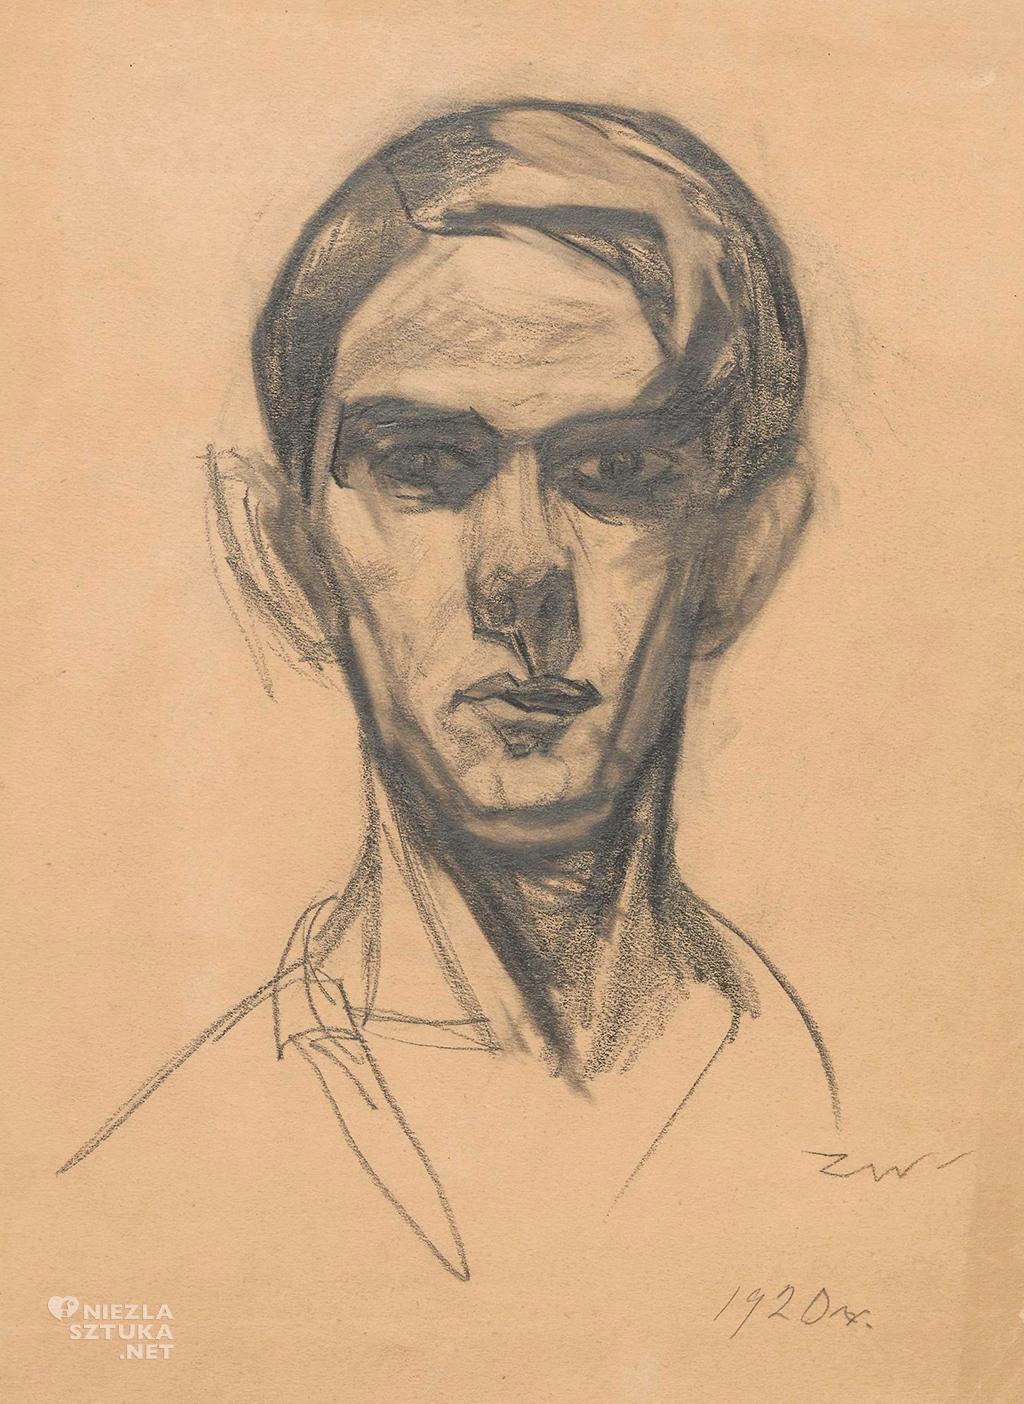 Zygmunt Waliszewski, Autoportret, rysunek, Niezła sztuka